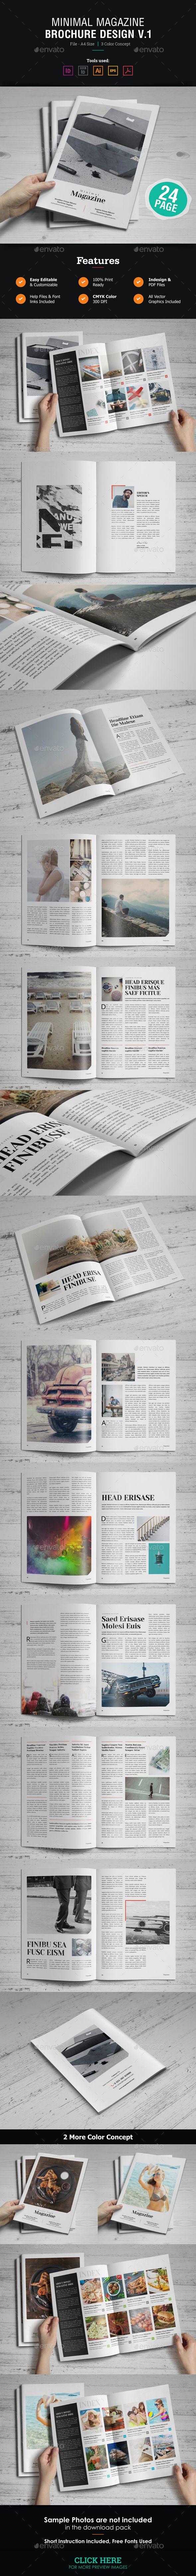 Minimal Magazine Design | Minimal, Magazines and Template